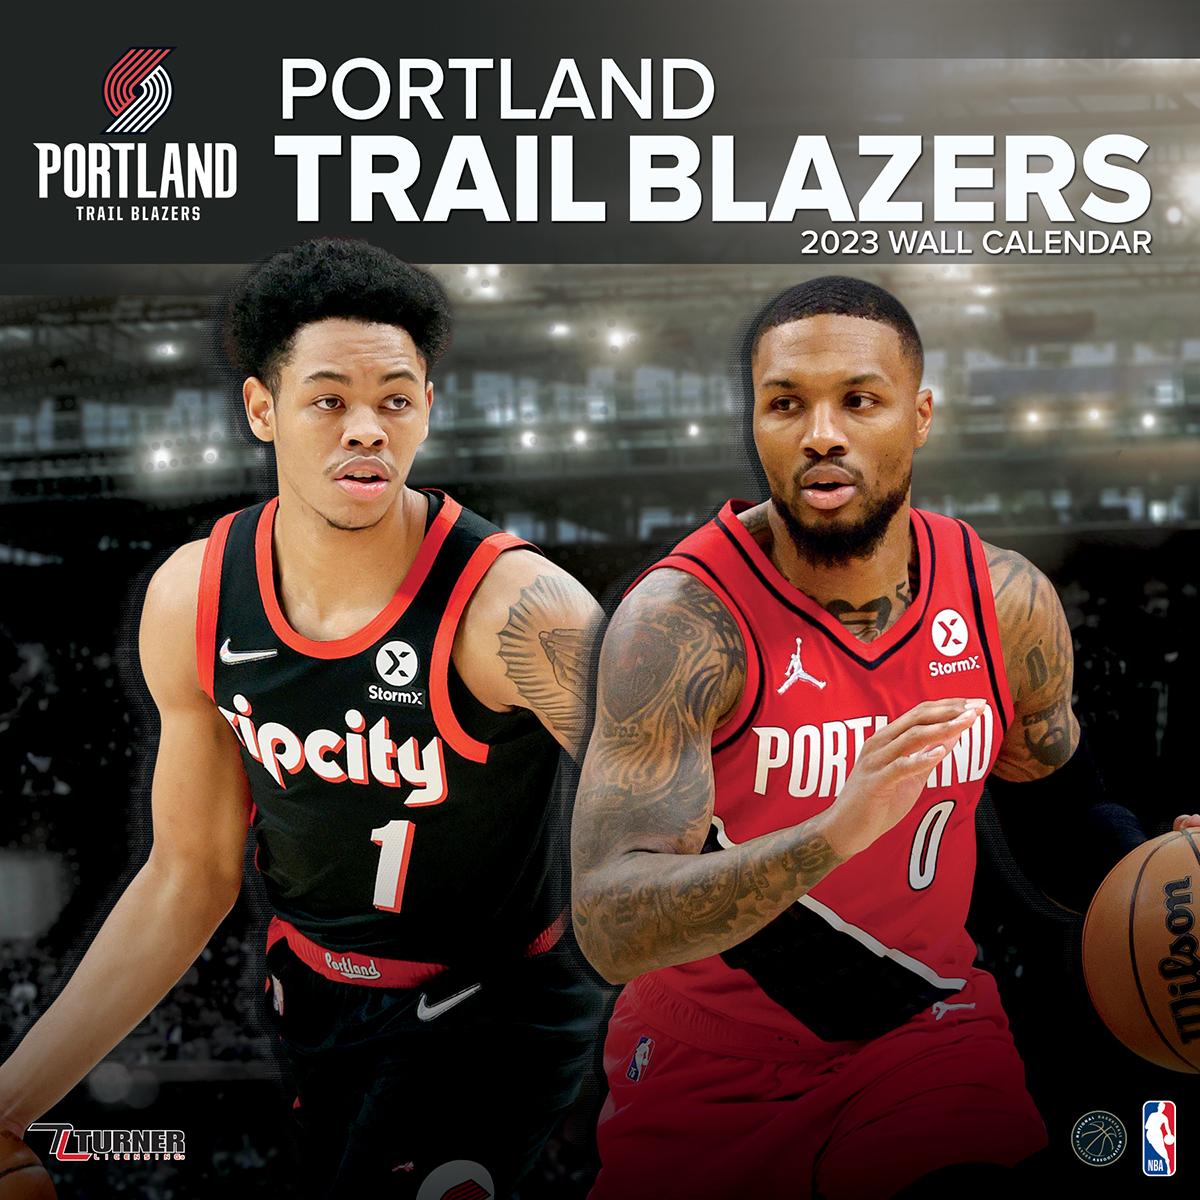 Portland Trail Blazers 2019 Wall Calendar